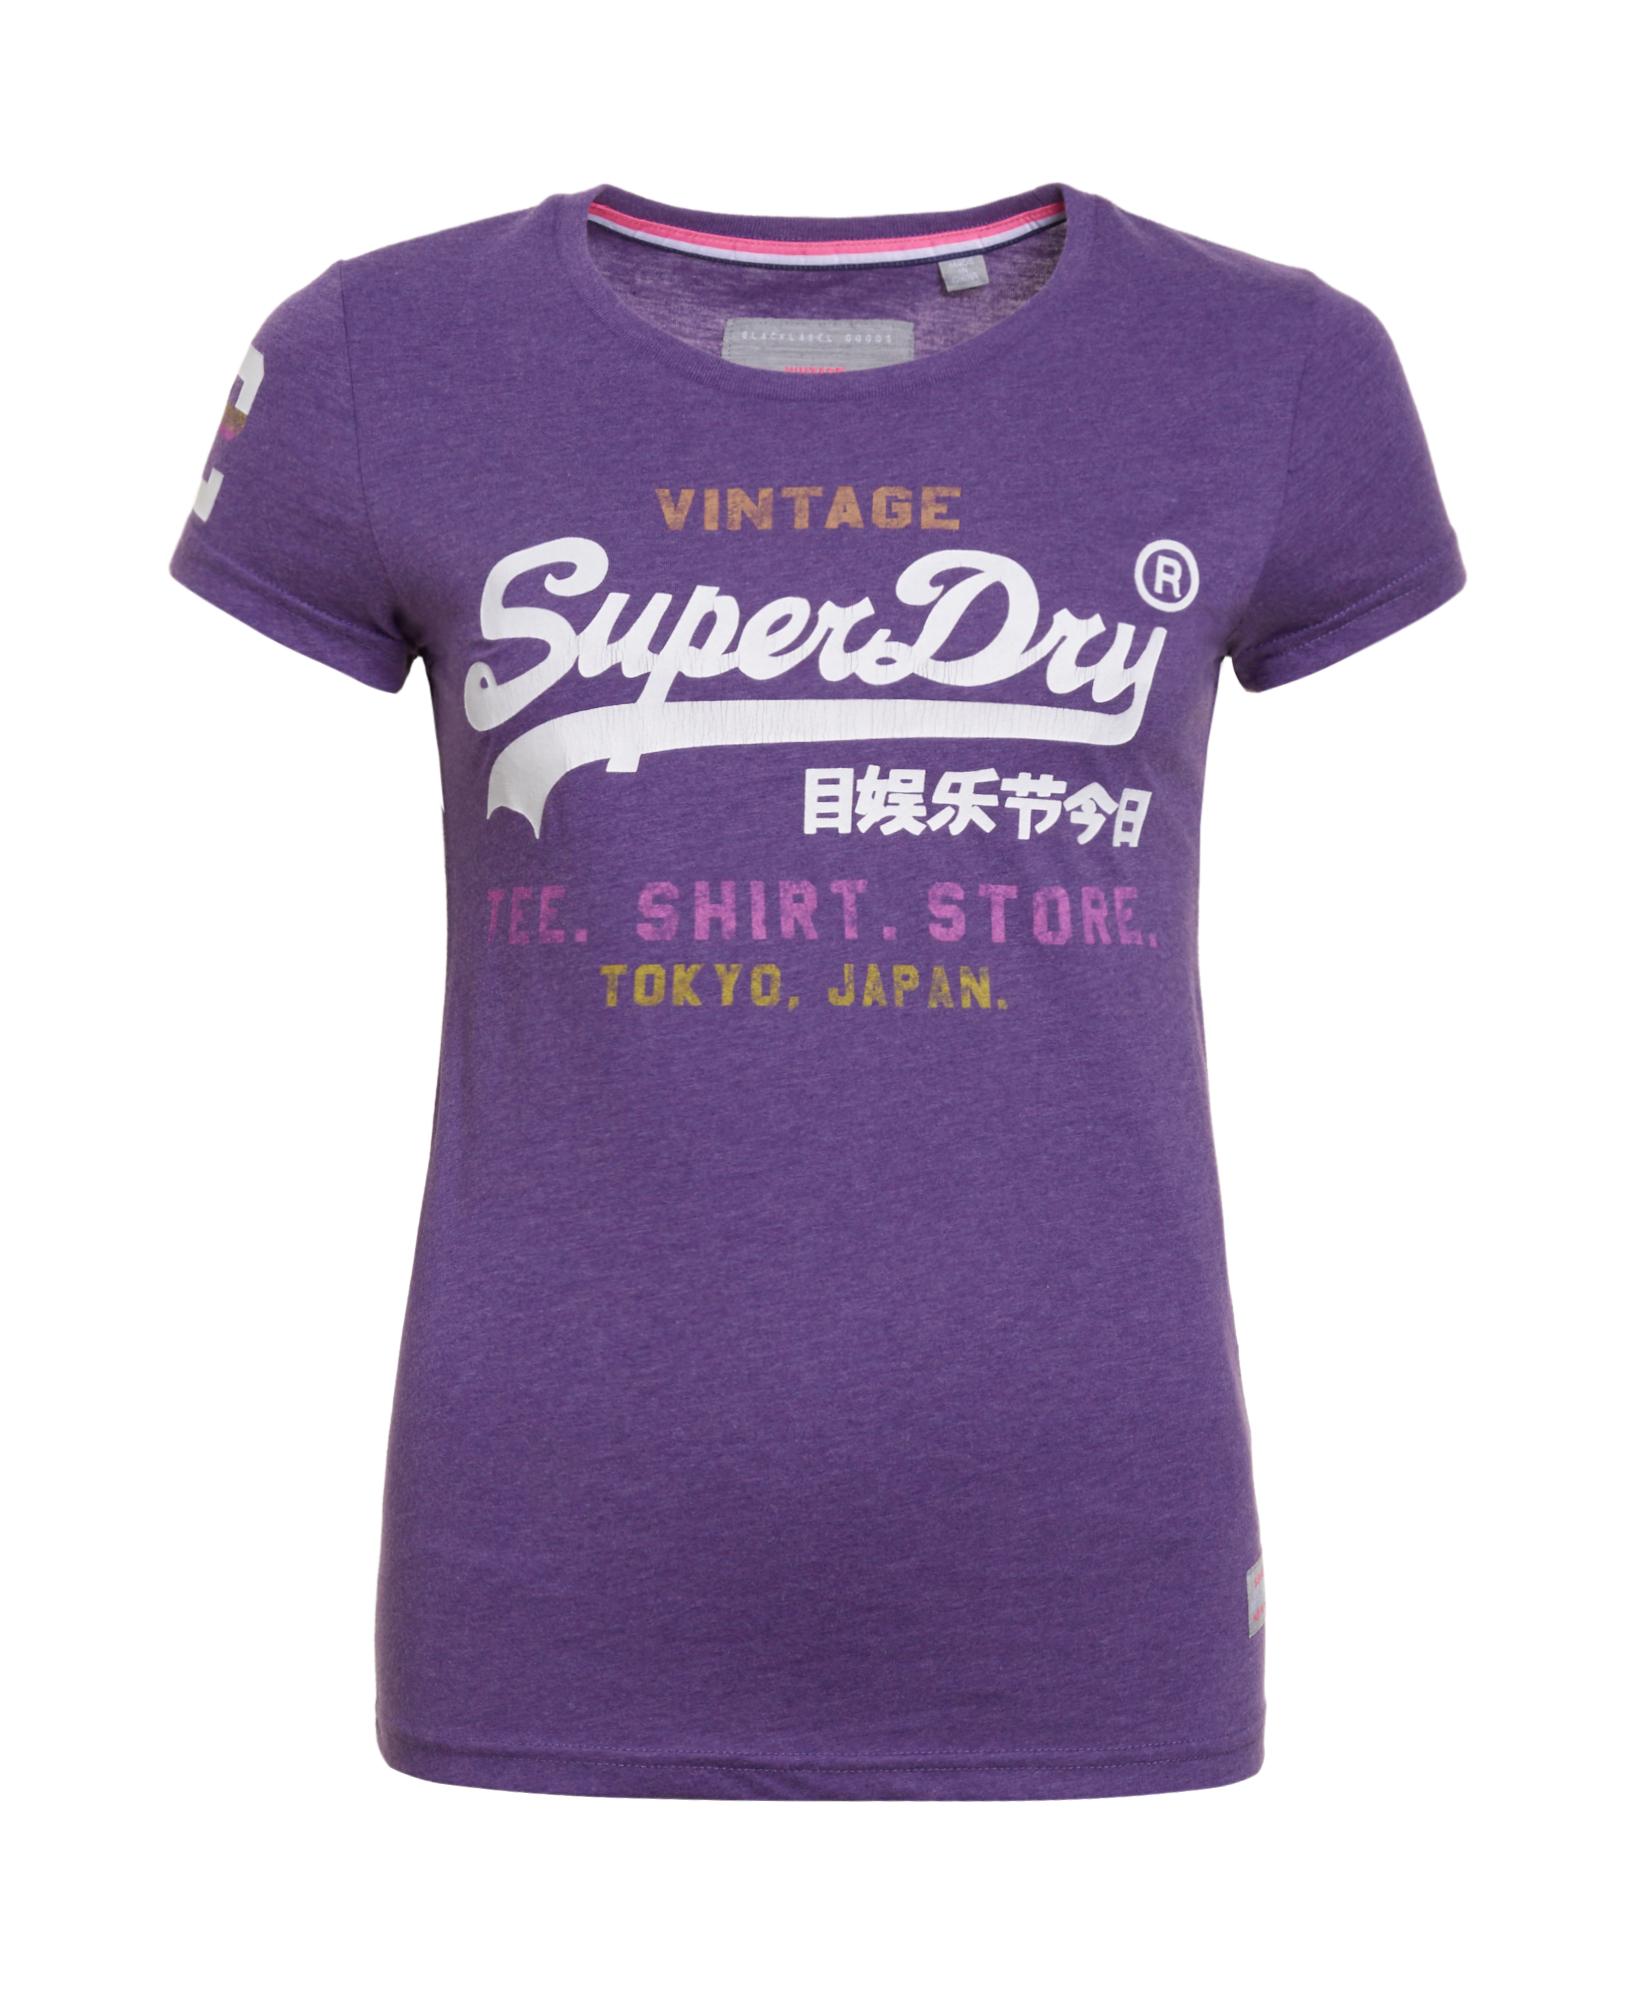 separation shoes 11c56 2be2b Details zu Neues Damen Superdry Shirt Shop T-shirt Polo Lila Meliert